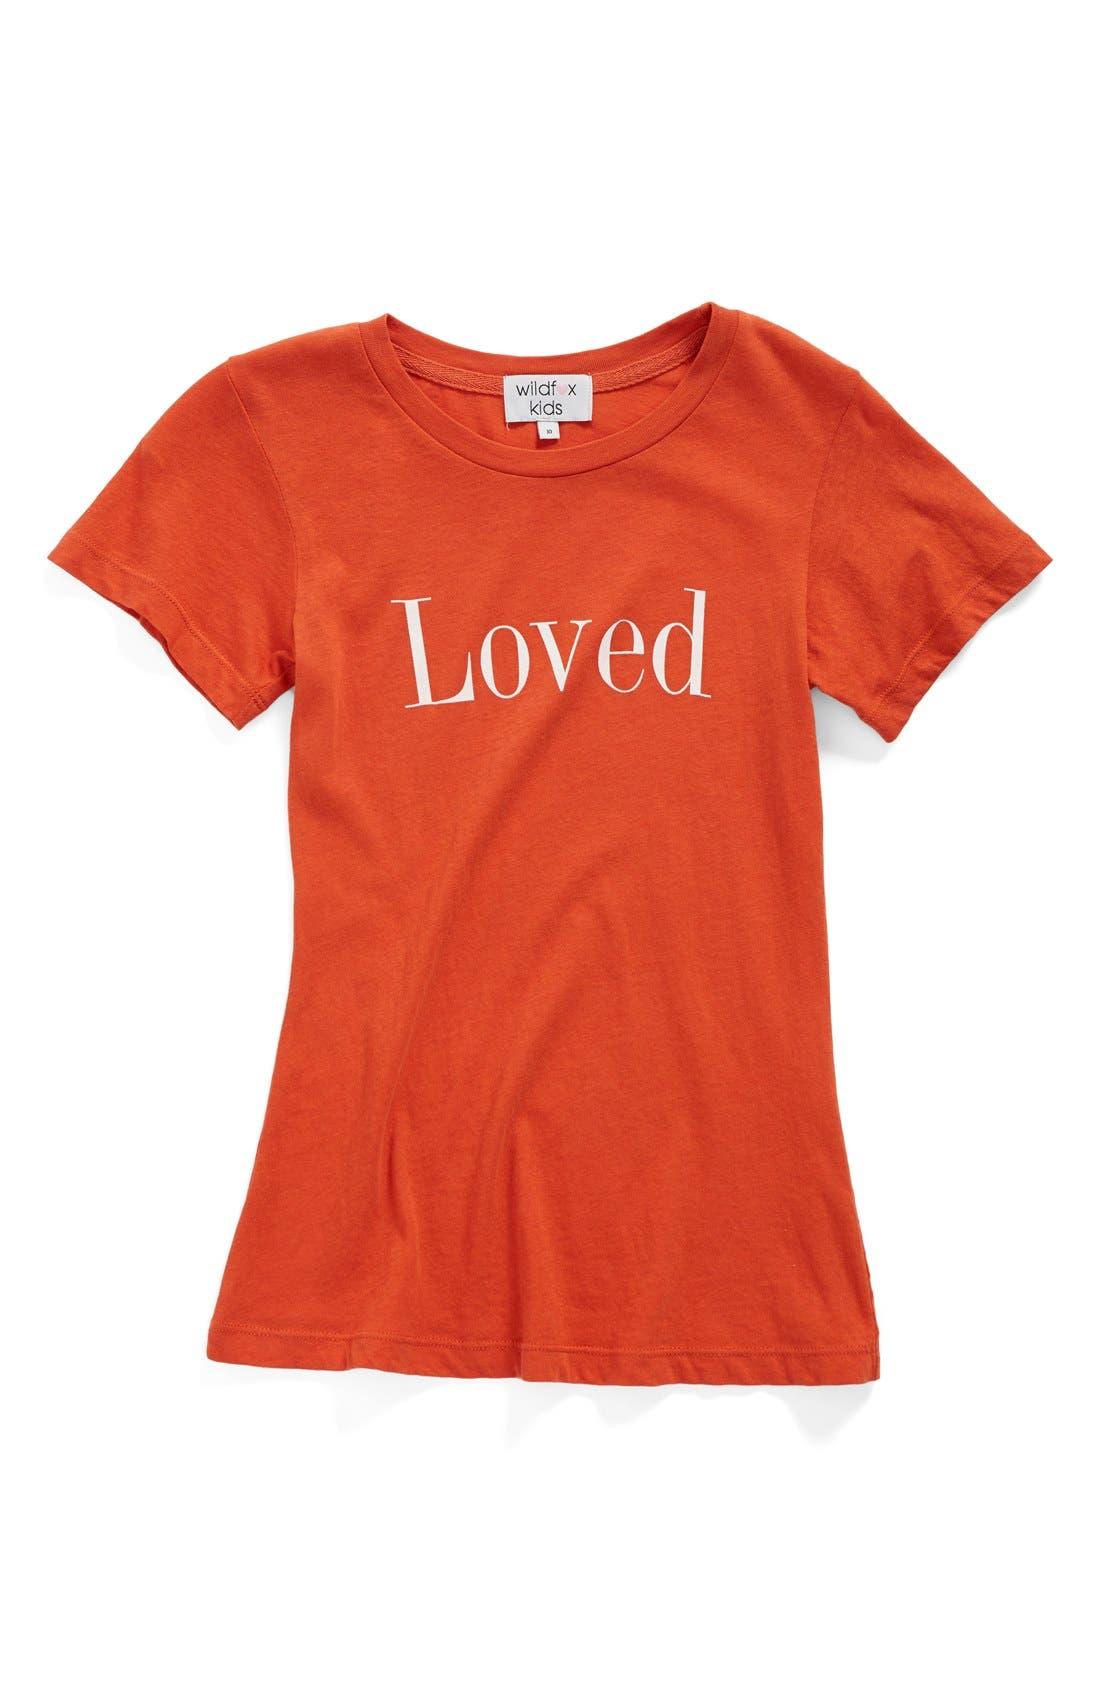 Main Image - Wildfox 'Loved' Graphic Cotton Tee (Little Girls & Big Girls)